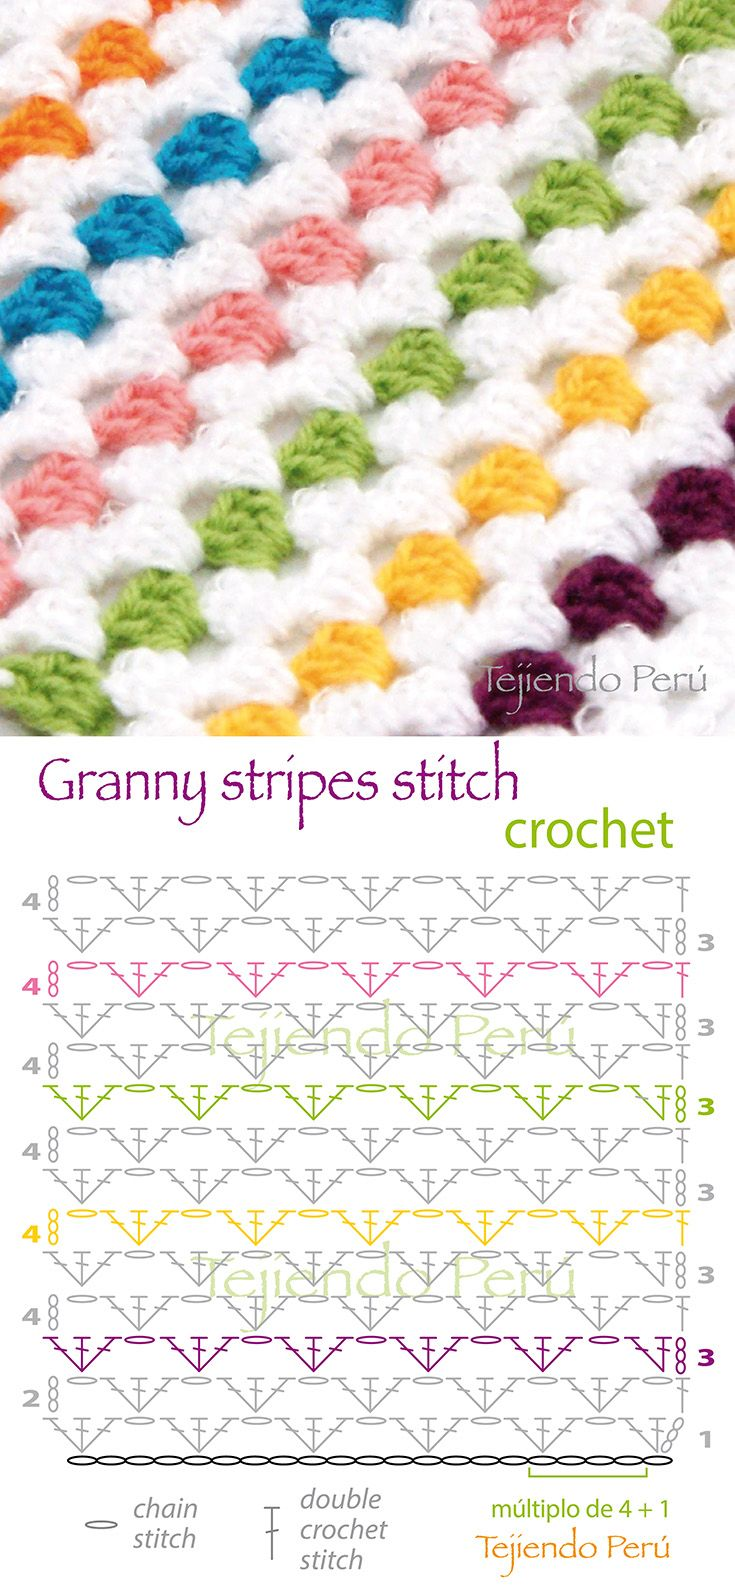 Crochet granny stripes stitch diagram! (Pattern or chart) | Crochet ...